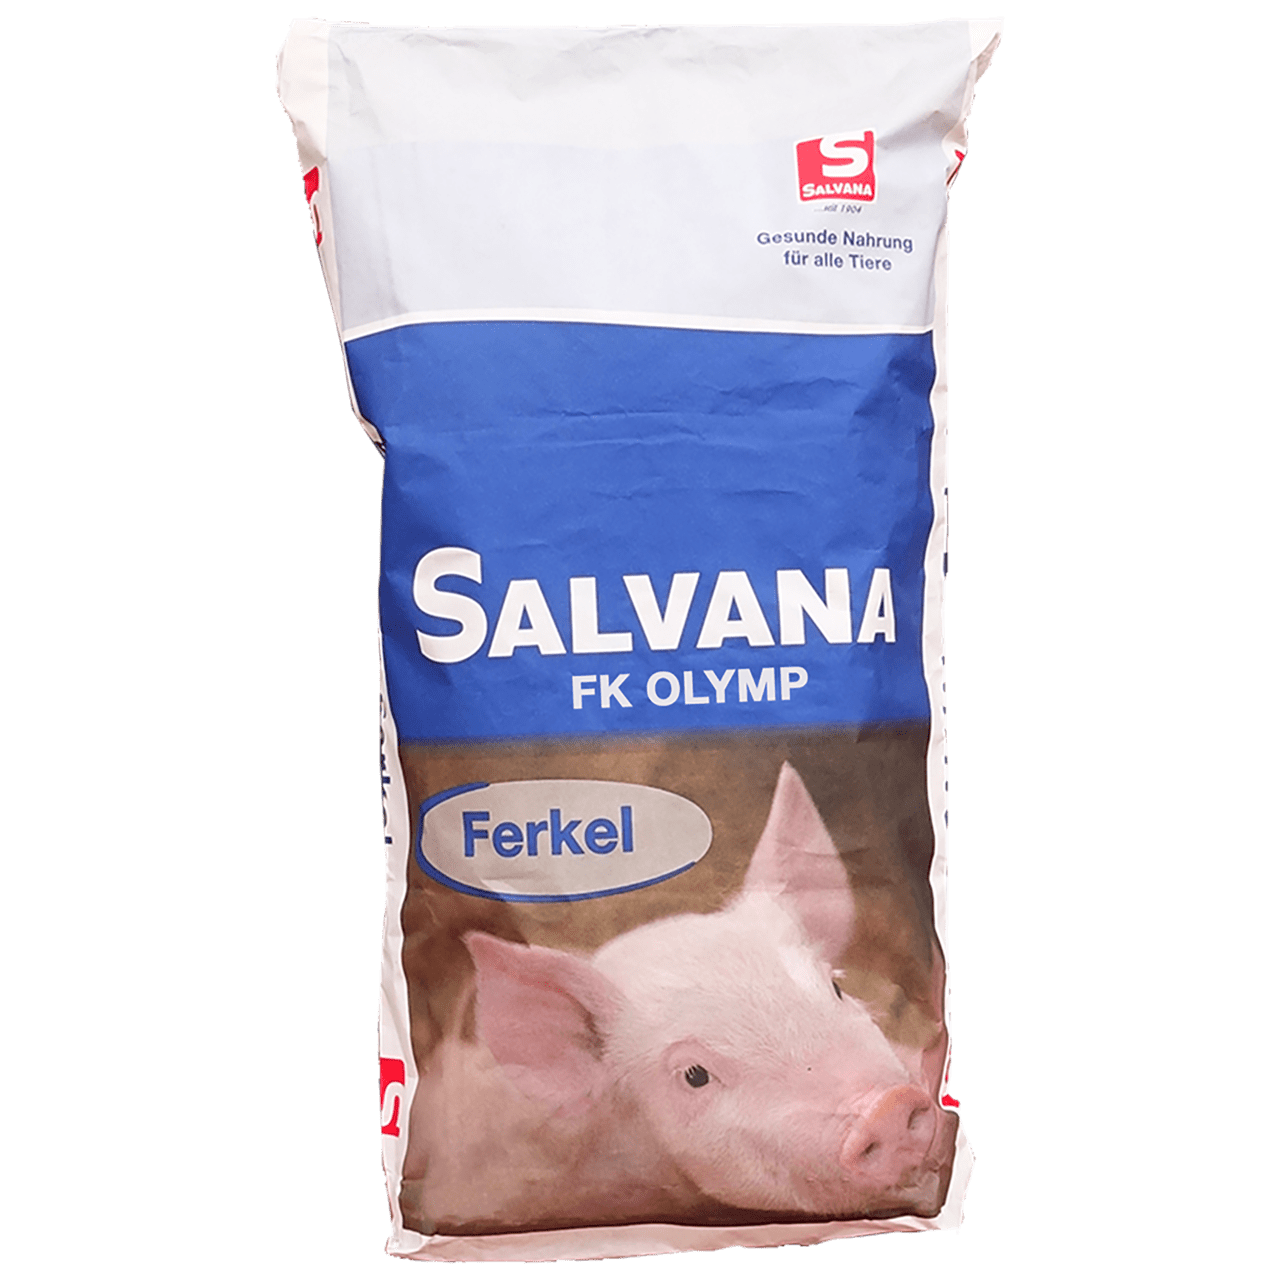 SALVANA FK OLYMP